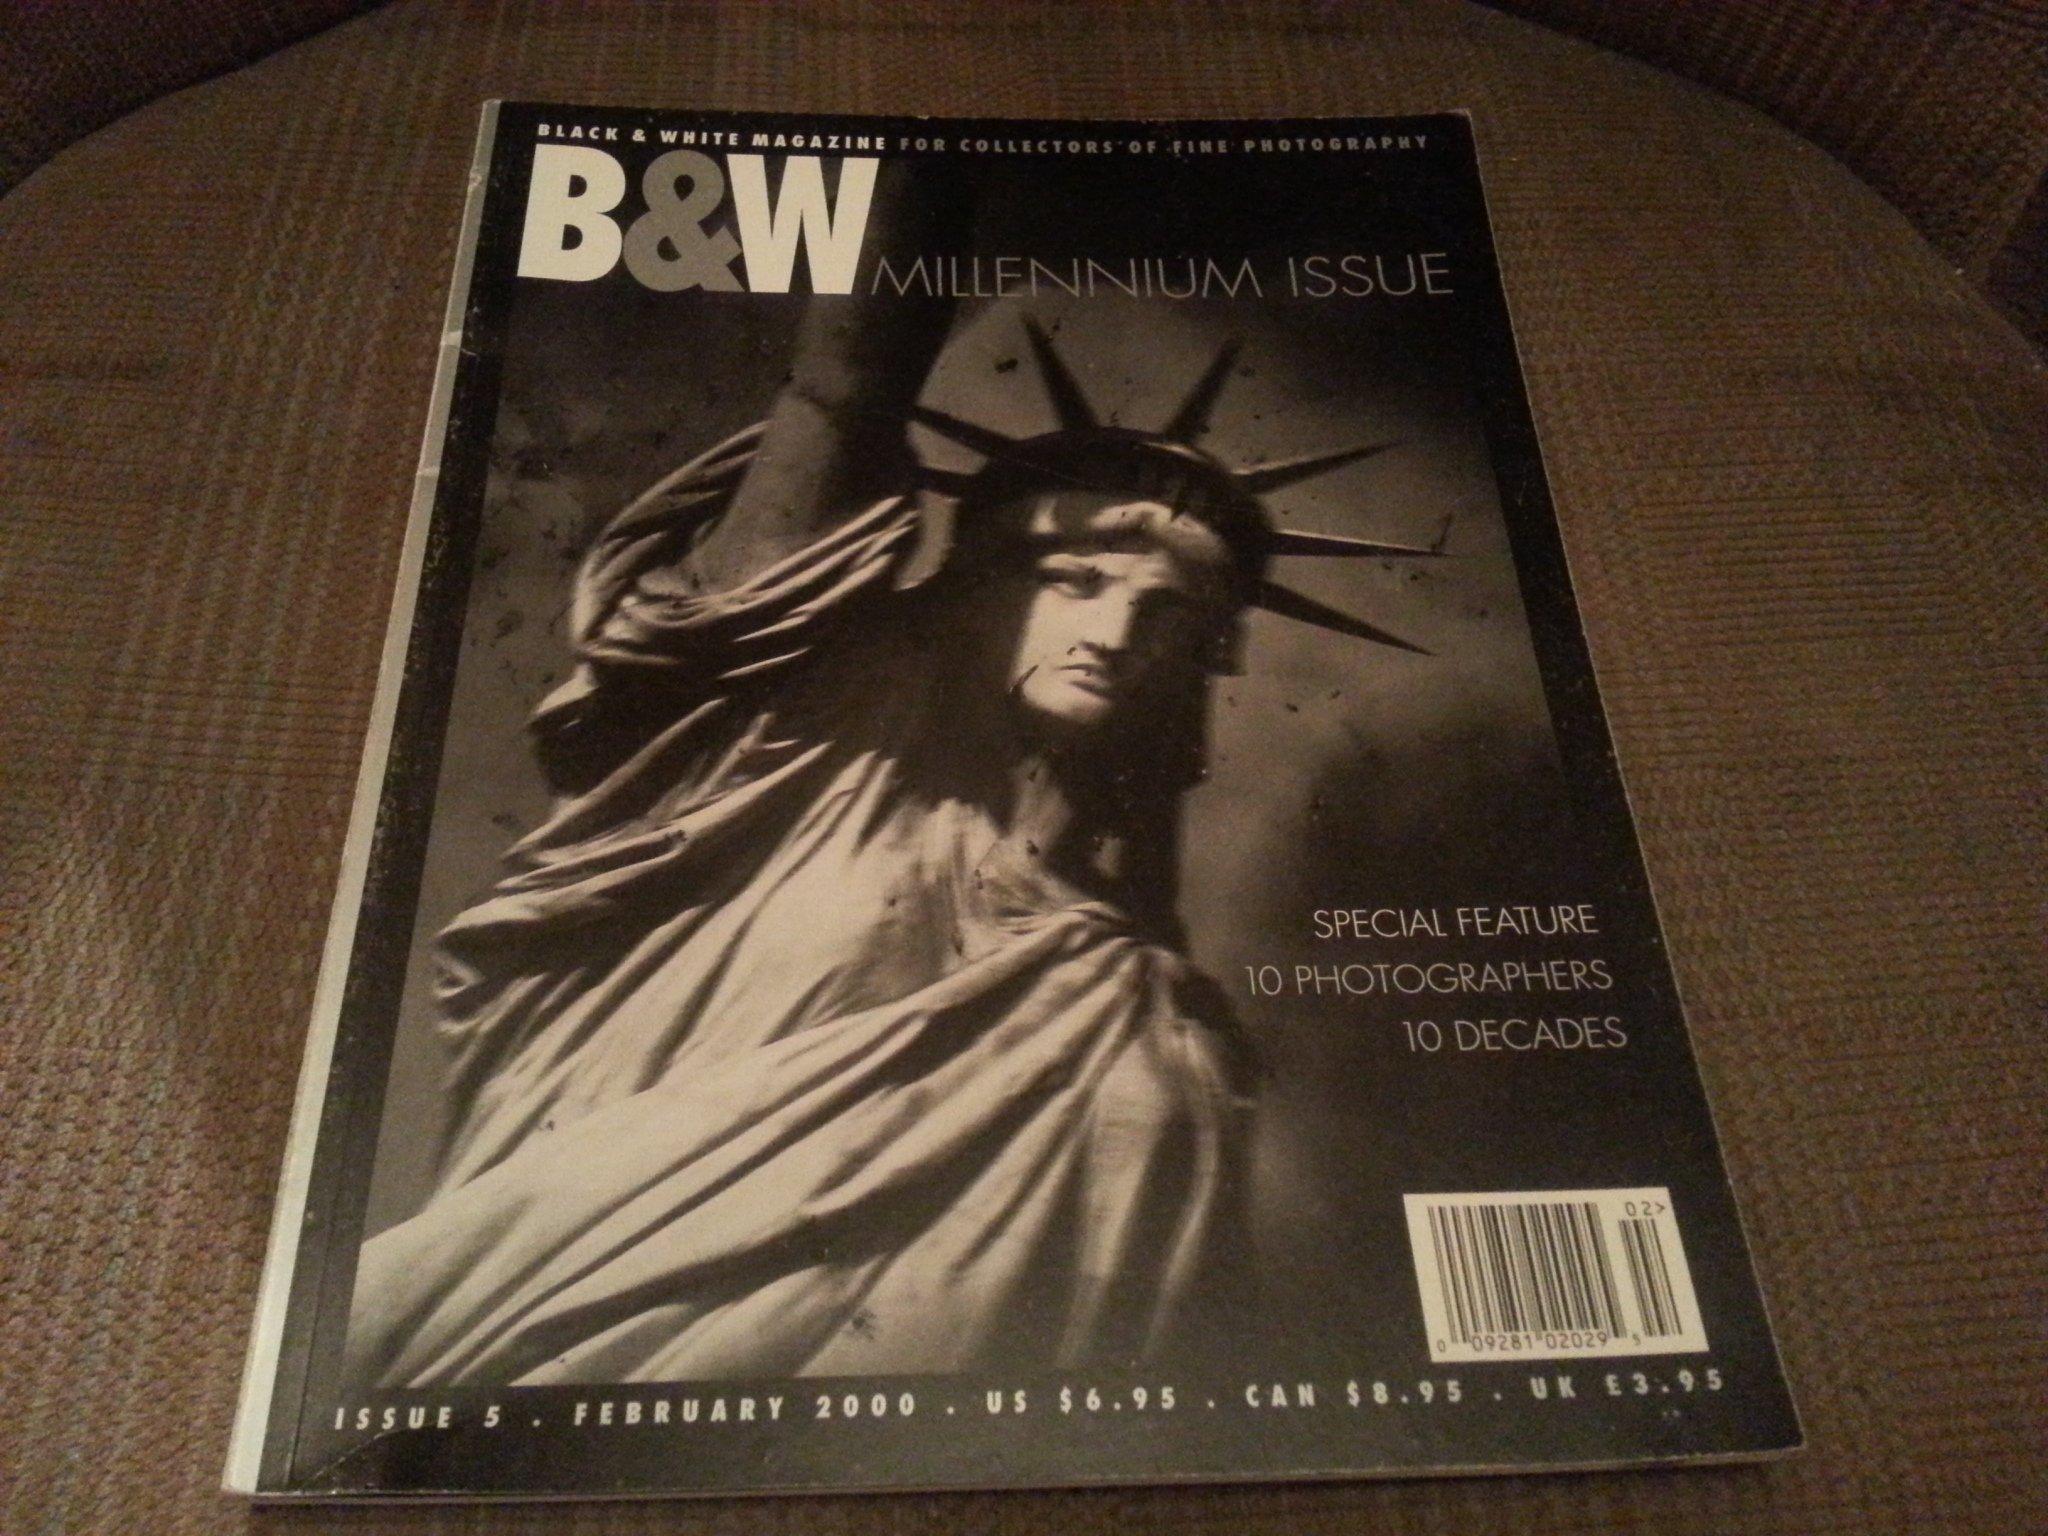 B&W, February 2000, No. 5